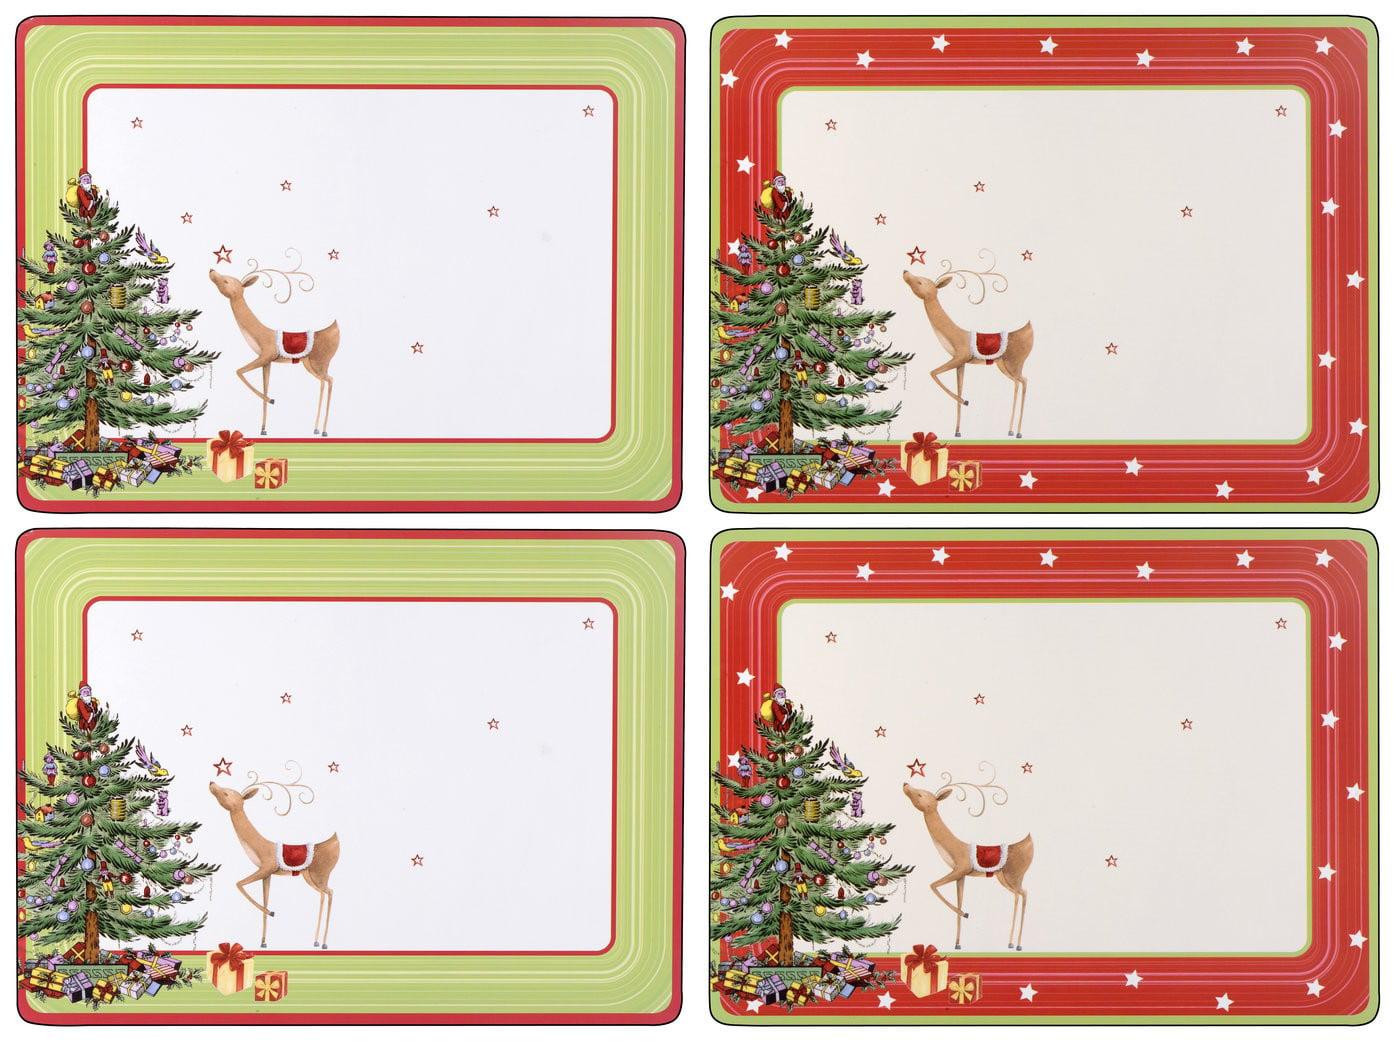 spode christmas jubilee 4 pc placemat set walmartcom